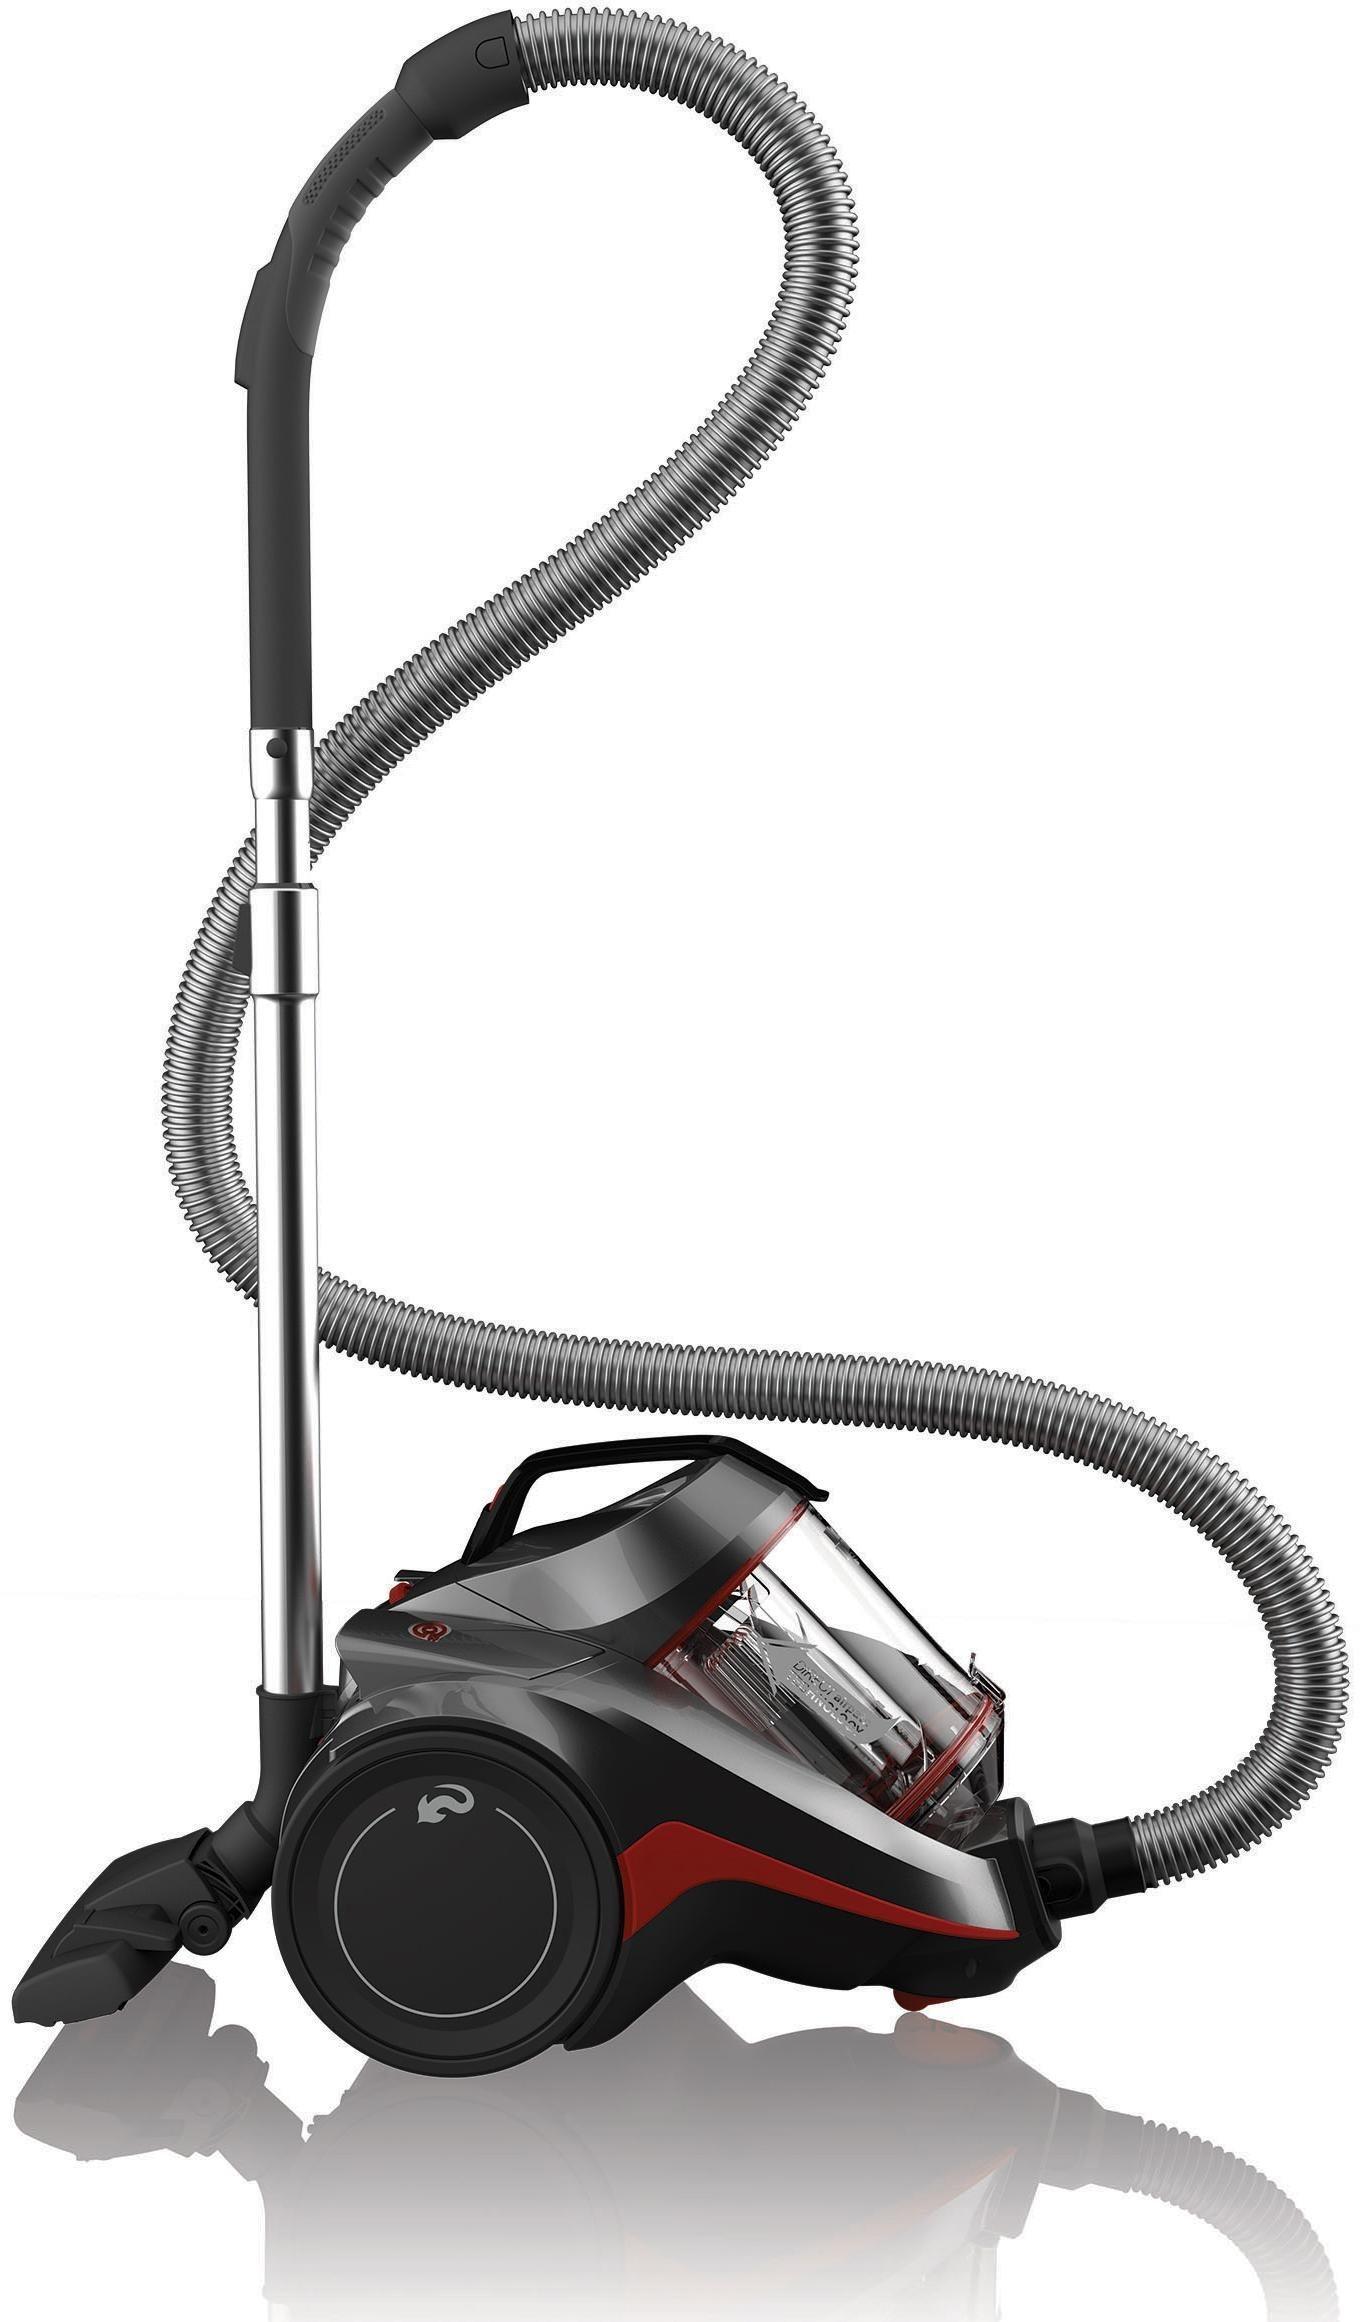 Bodenstaubsauger DD2226-3, REBEL26 Reach, 550 Watt, beutellos